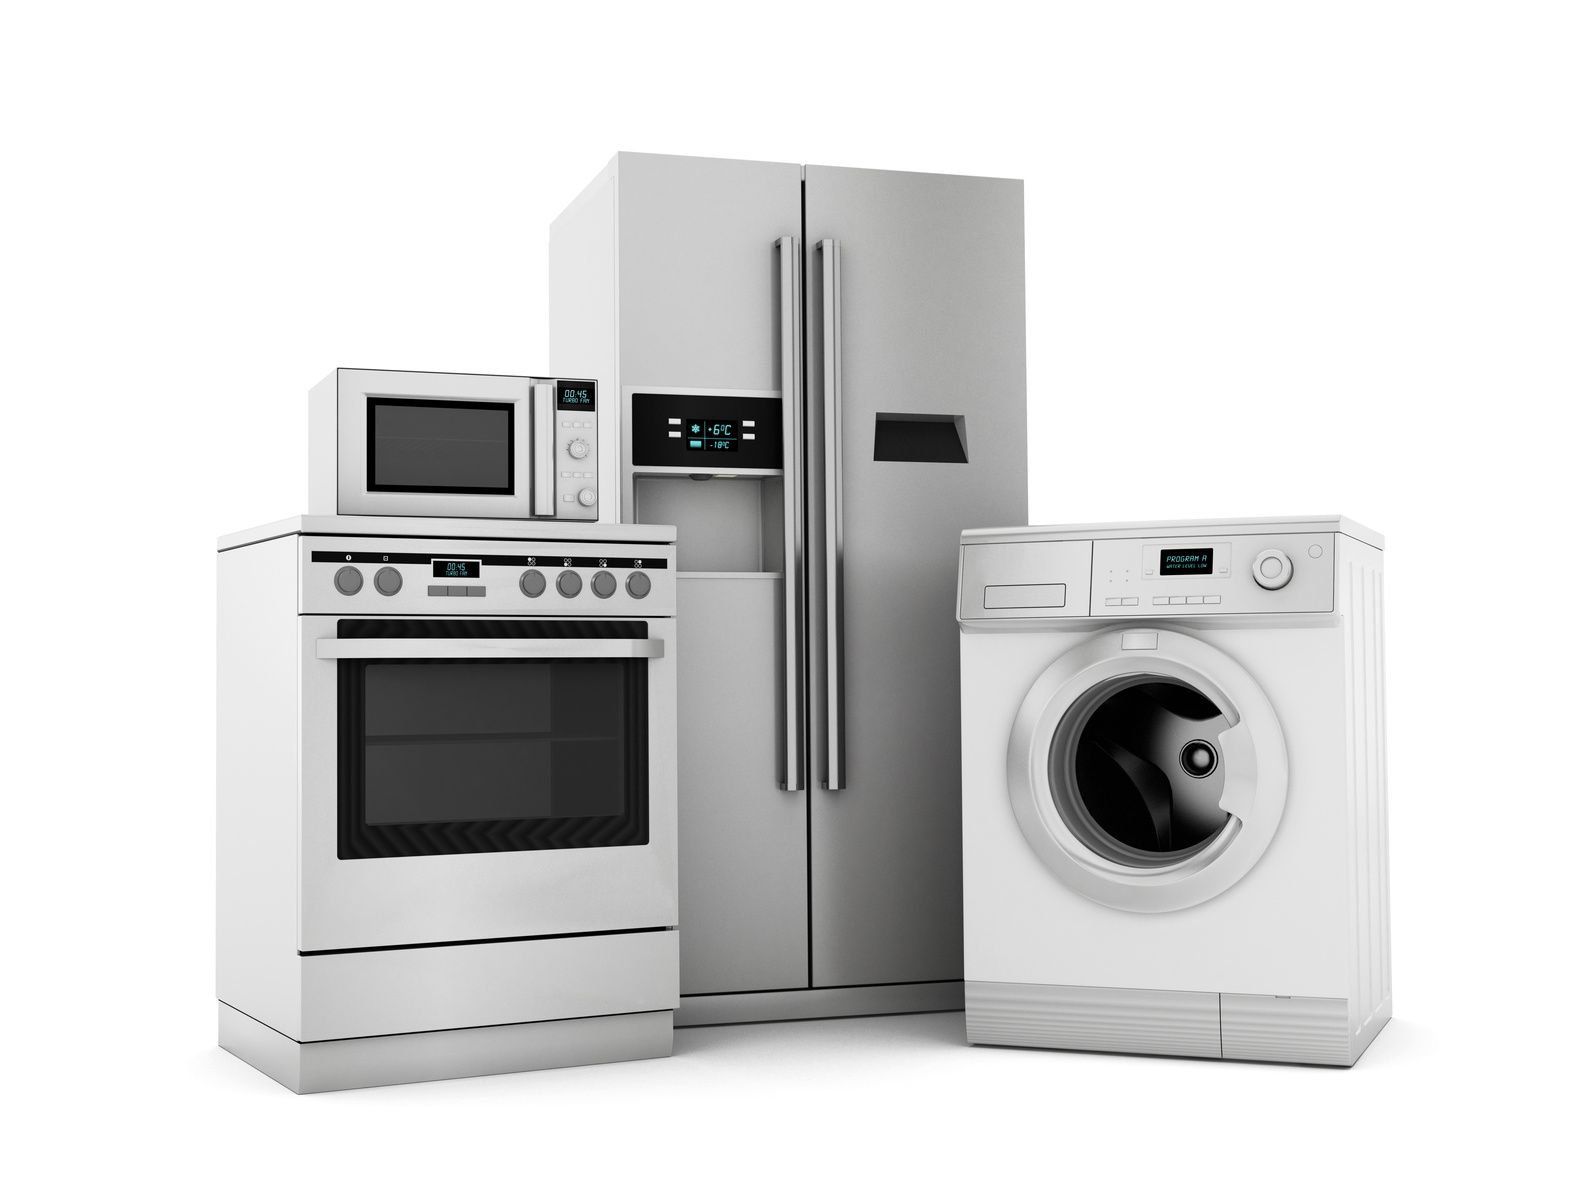 Purchasing Home Appliances Home Appliances Appliance Repair